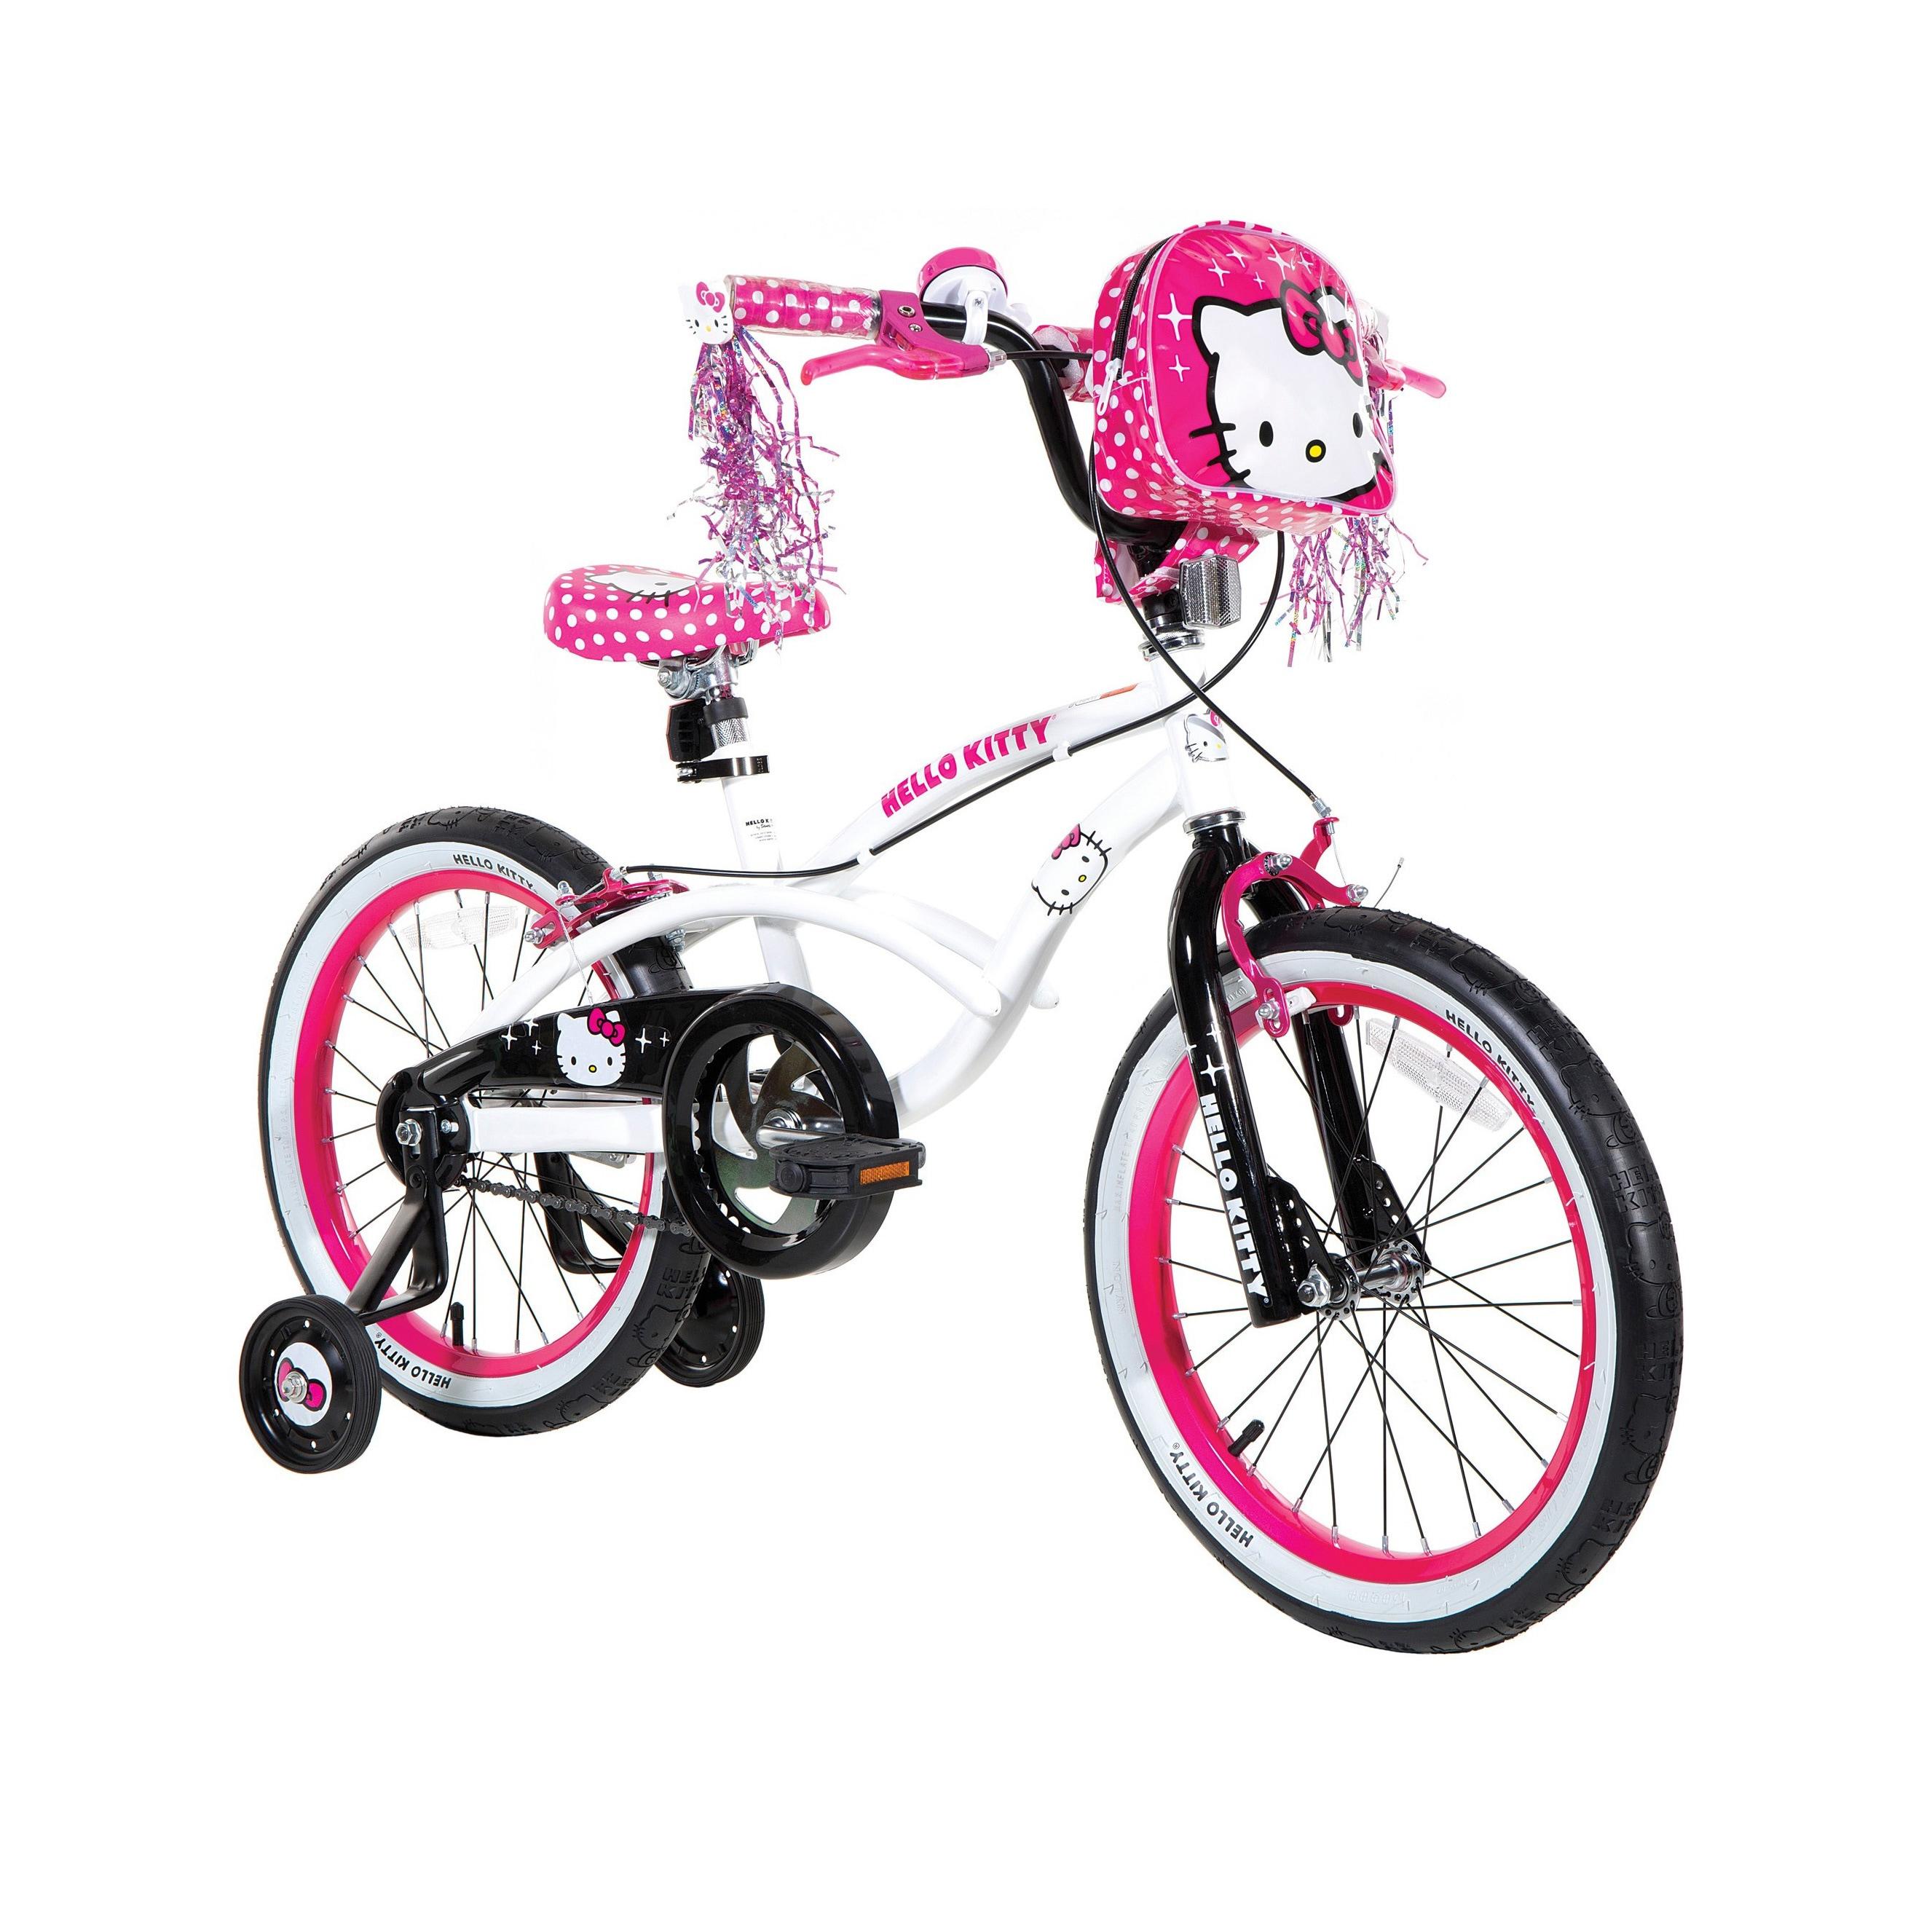 LTD Hello Kitty 18-inch Girls Bike (18'' Hot Pink, White)